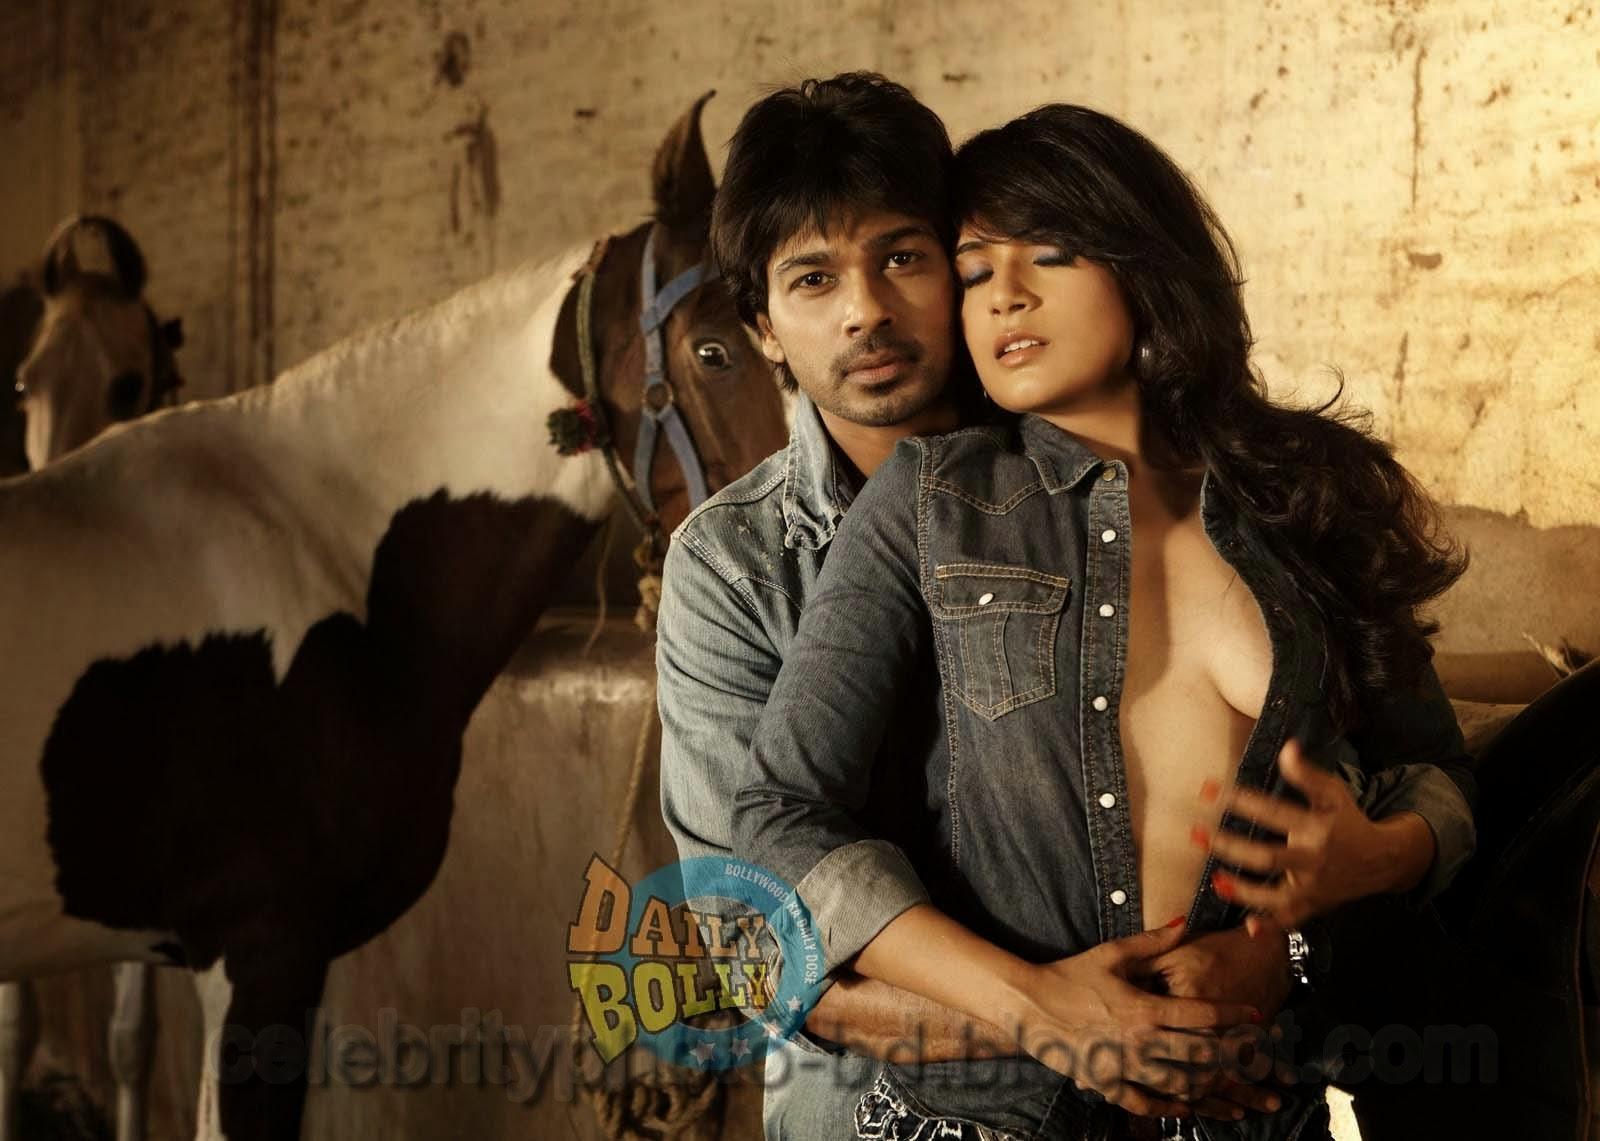 Watch+Gangs+of+Wasseypur+girl+Richa+Chadda's+turn+super+Hot+Shoot001